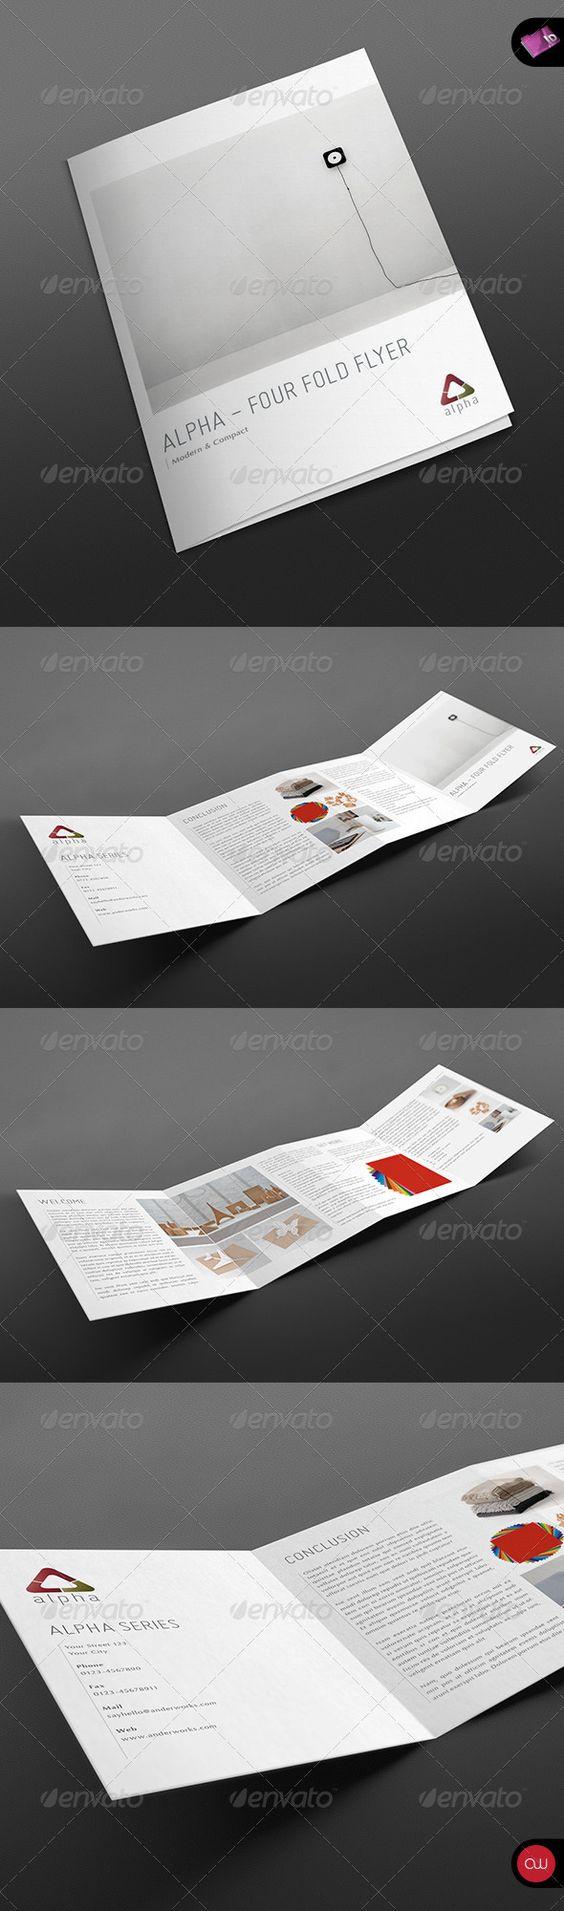 4 fold brochure alpha series logos paragraph and flyers. Black Bedroom Furniture Sets. Home Design Ideas